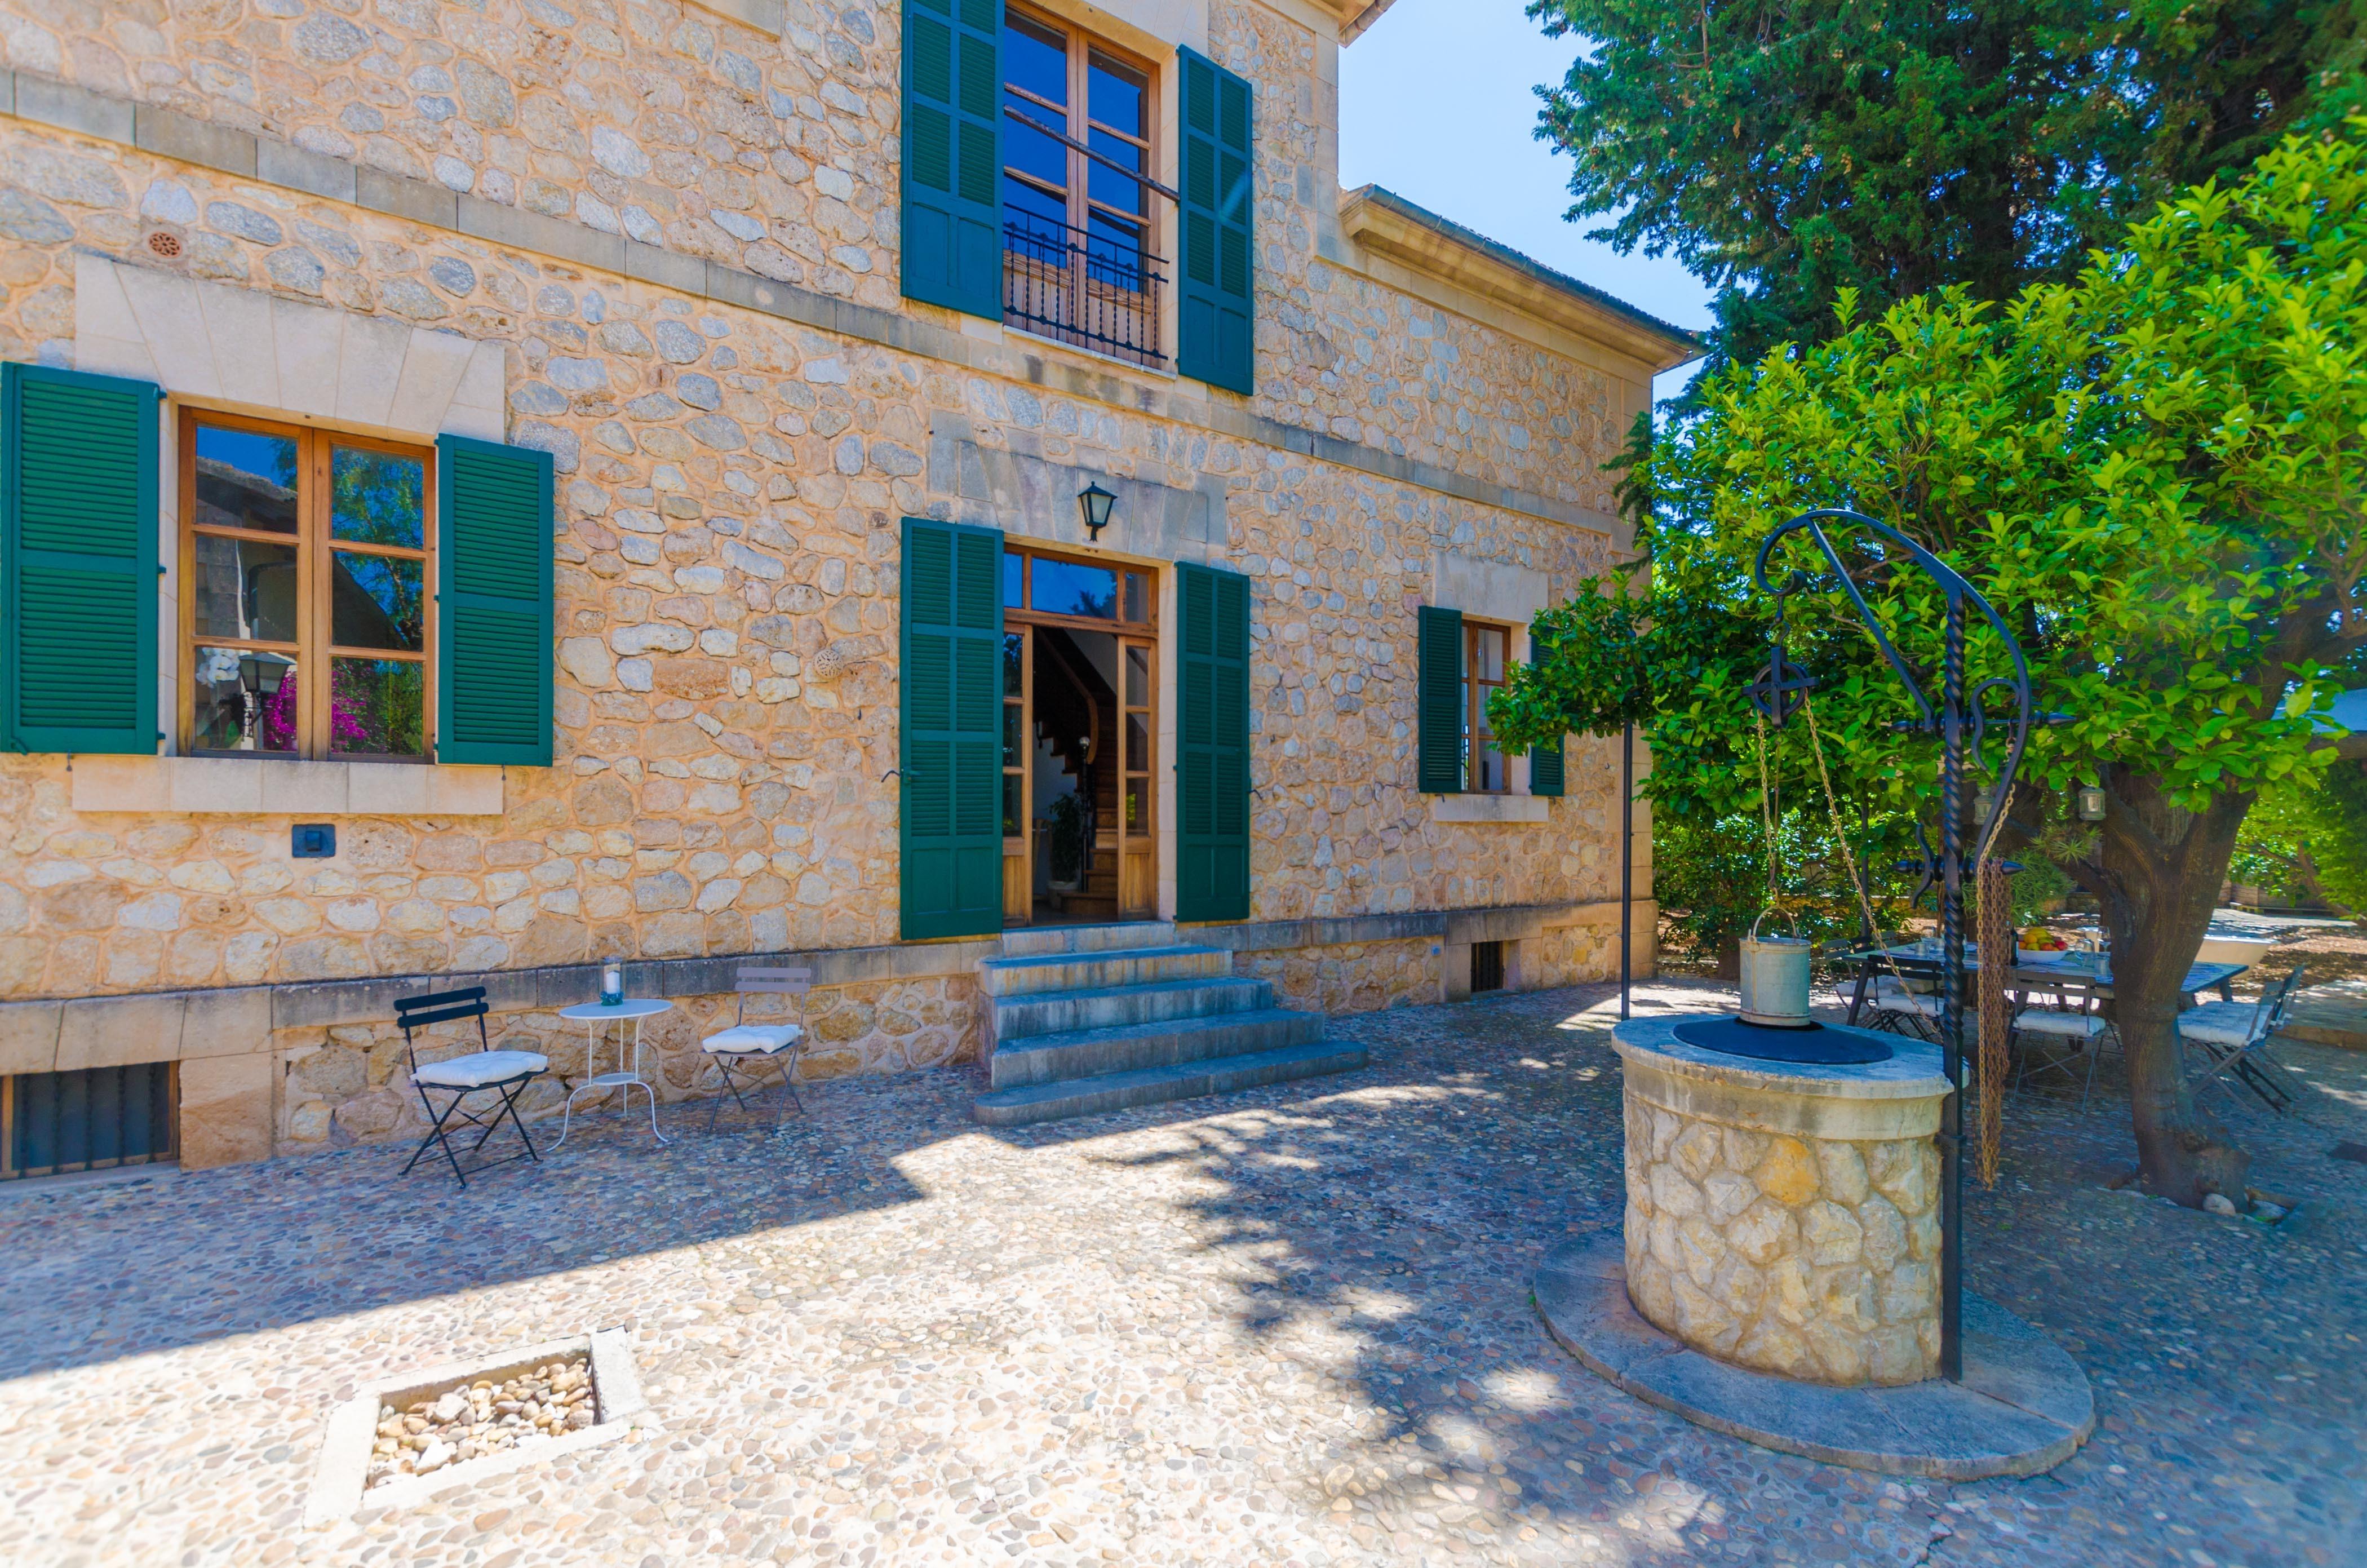 Maison de vacances CAS CONVIDATS (2435013), Alaro, Majorque, Iles Baléares, Espagne, image 71